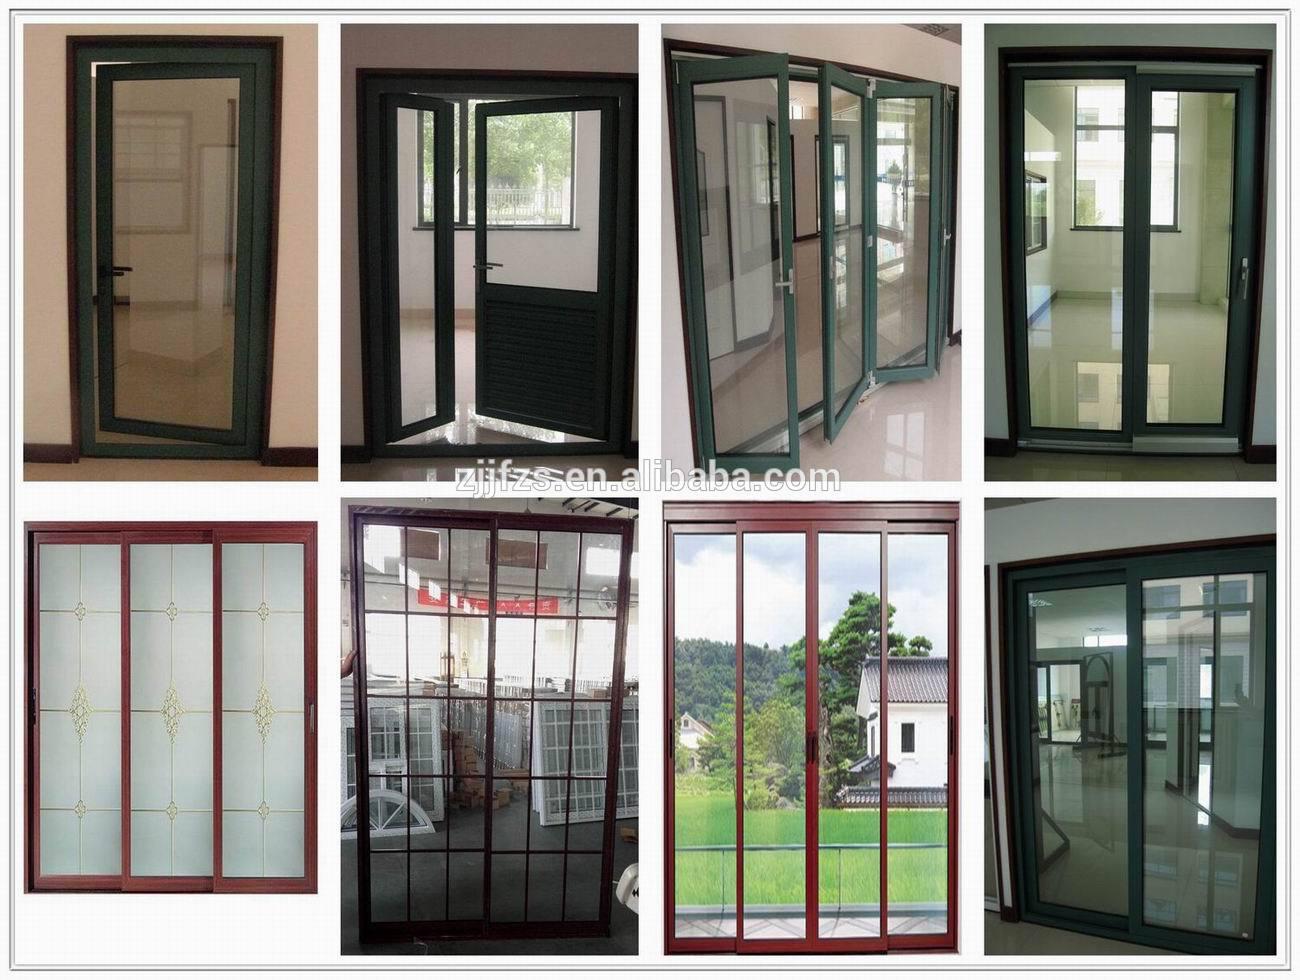 moderna de aluminio puerta corredera exterior puertas para balcones